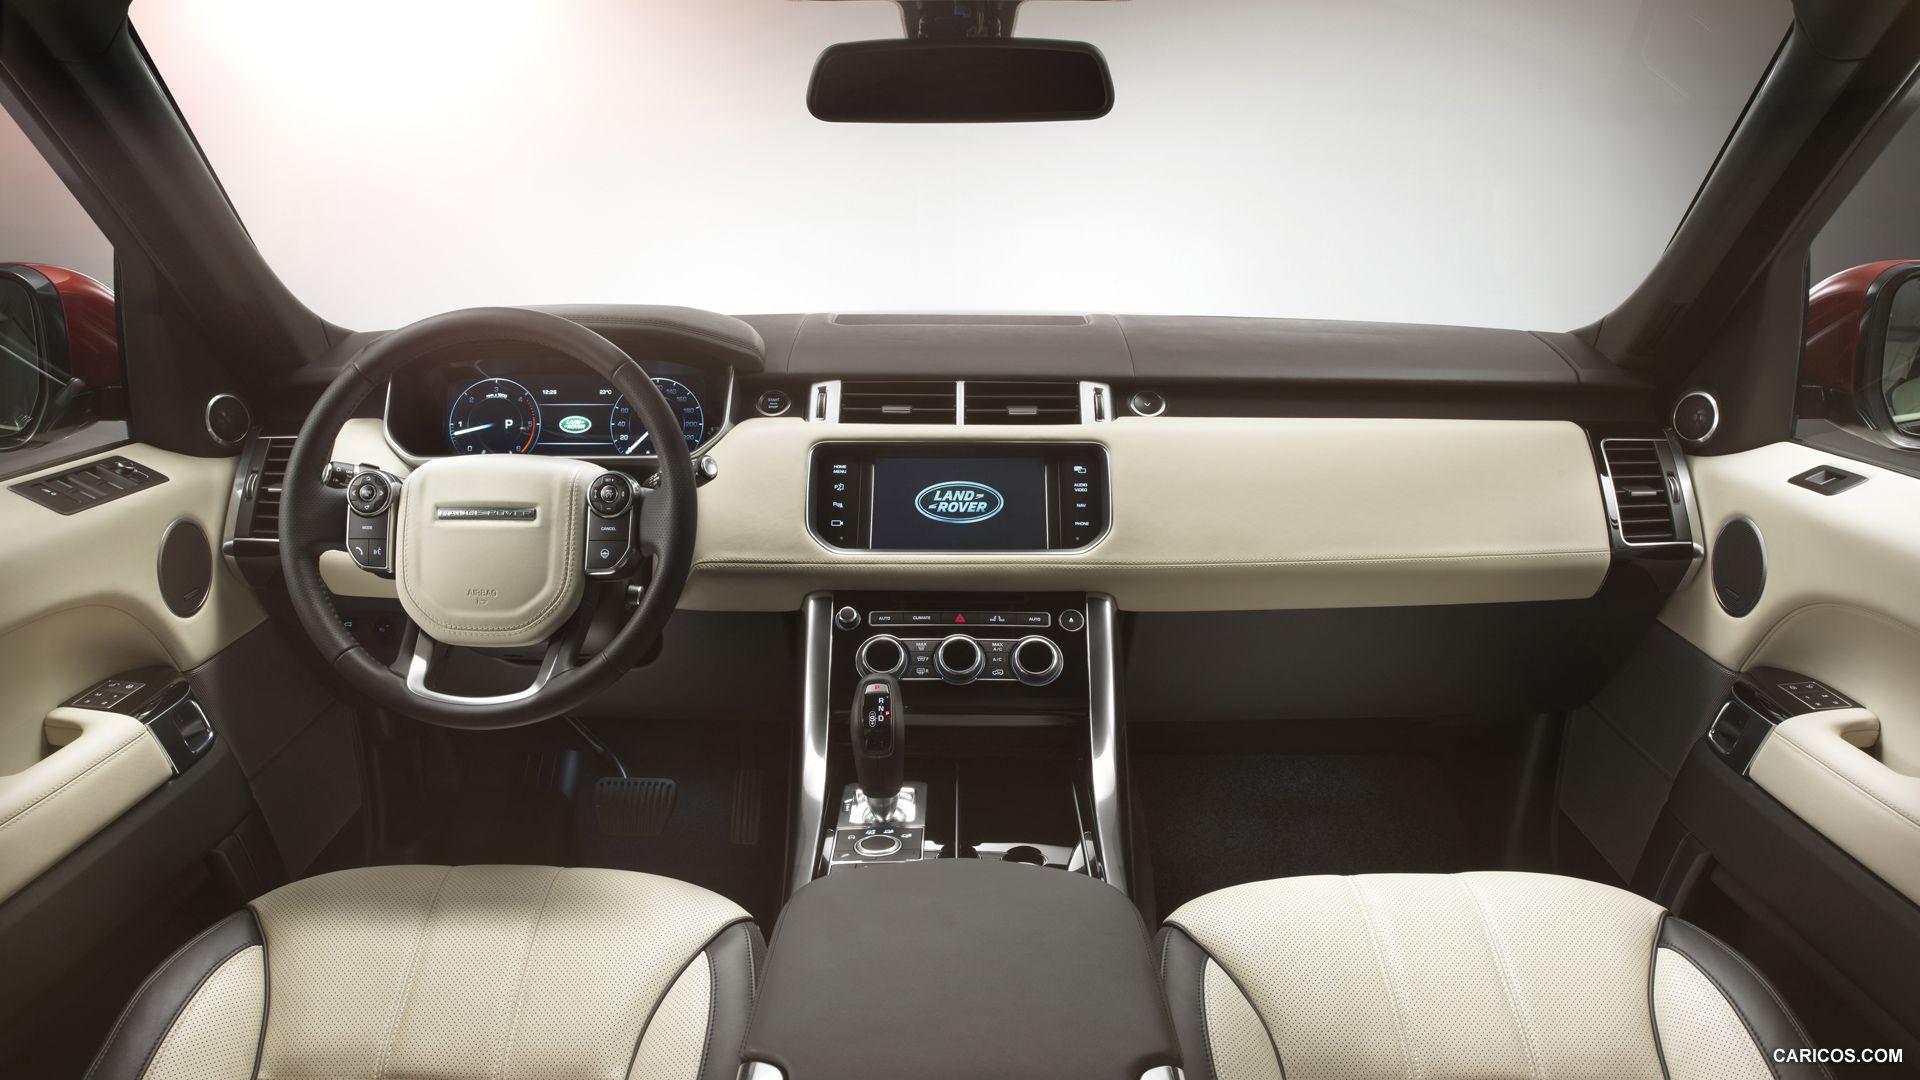 Range Rover Sport 2014 Ivory Interior Range Rover Sport Range Rover Interior Range Rover Sport 2014